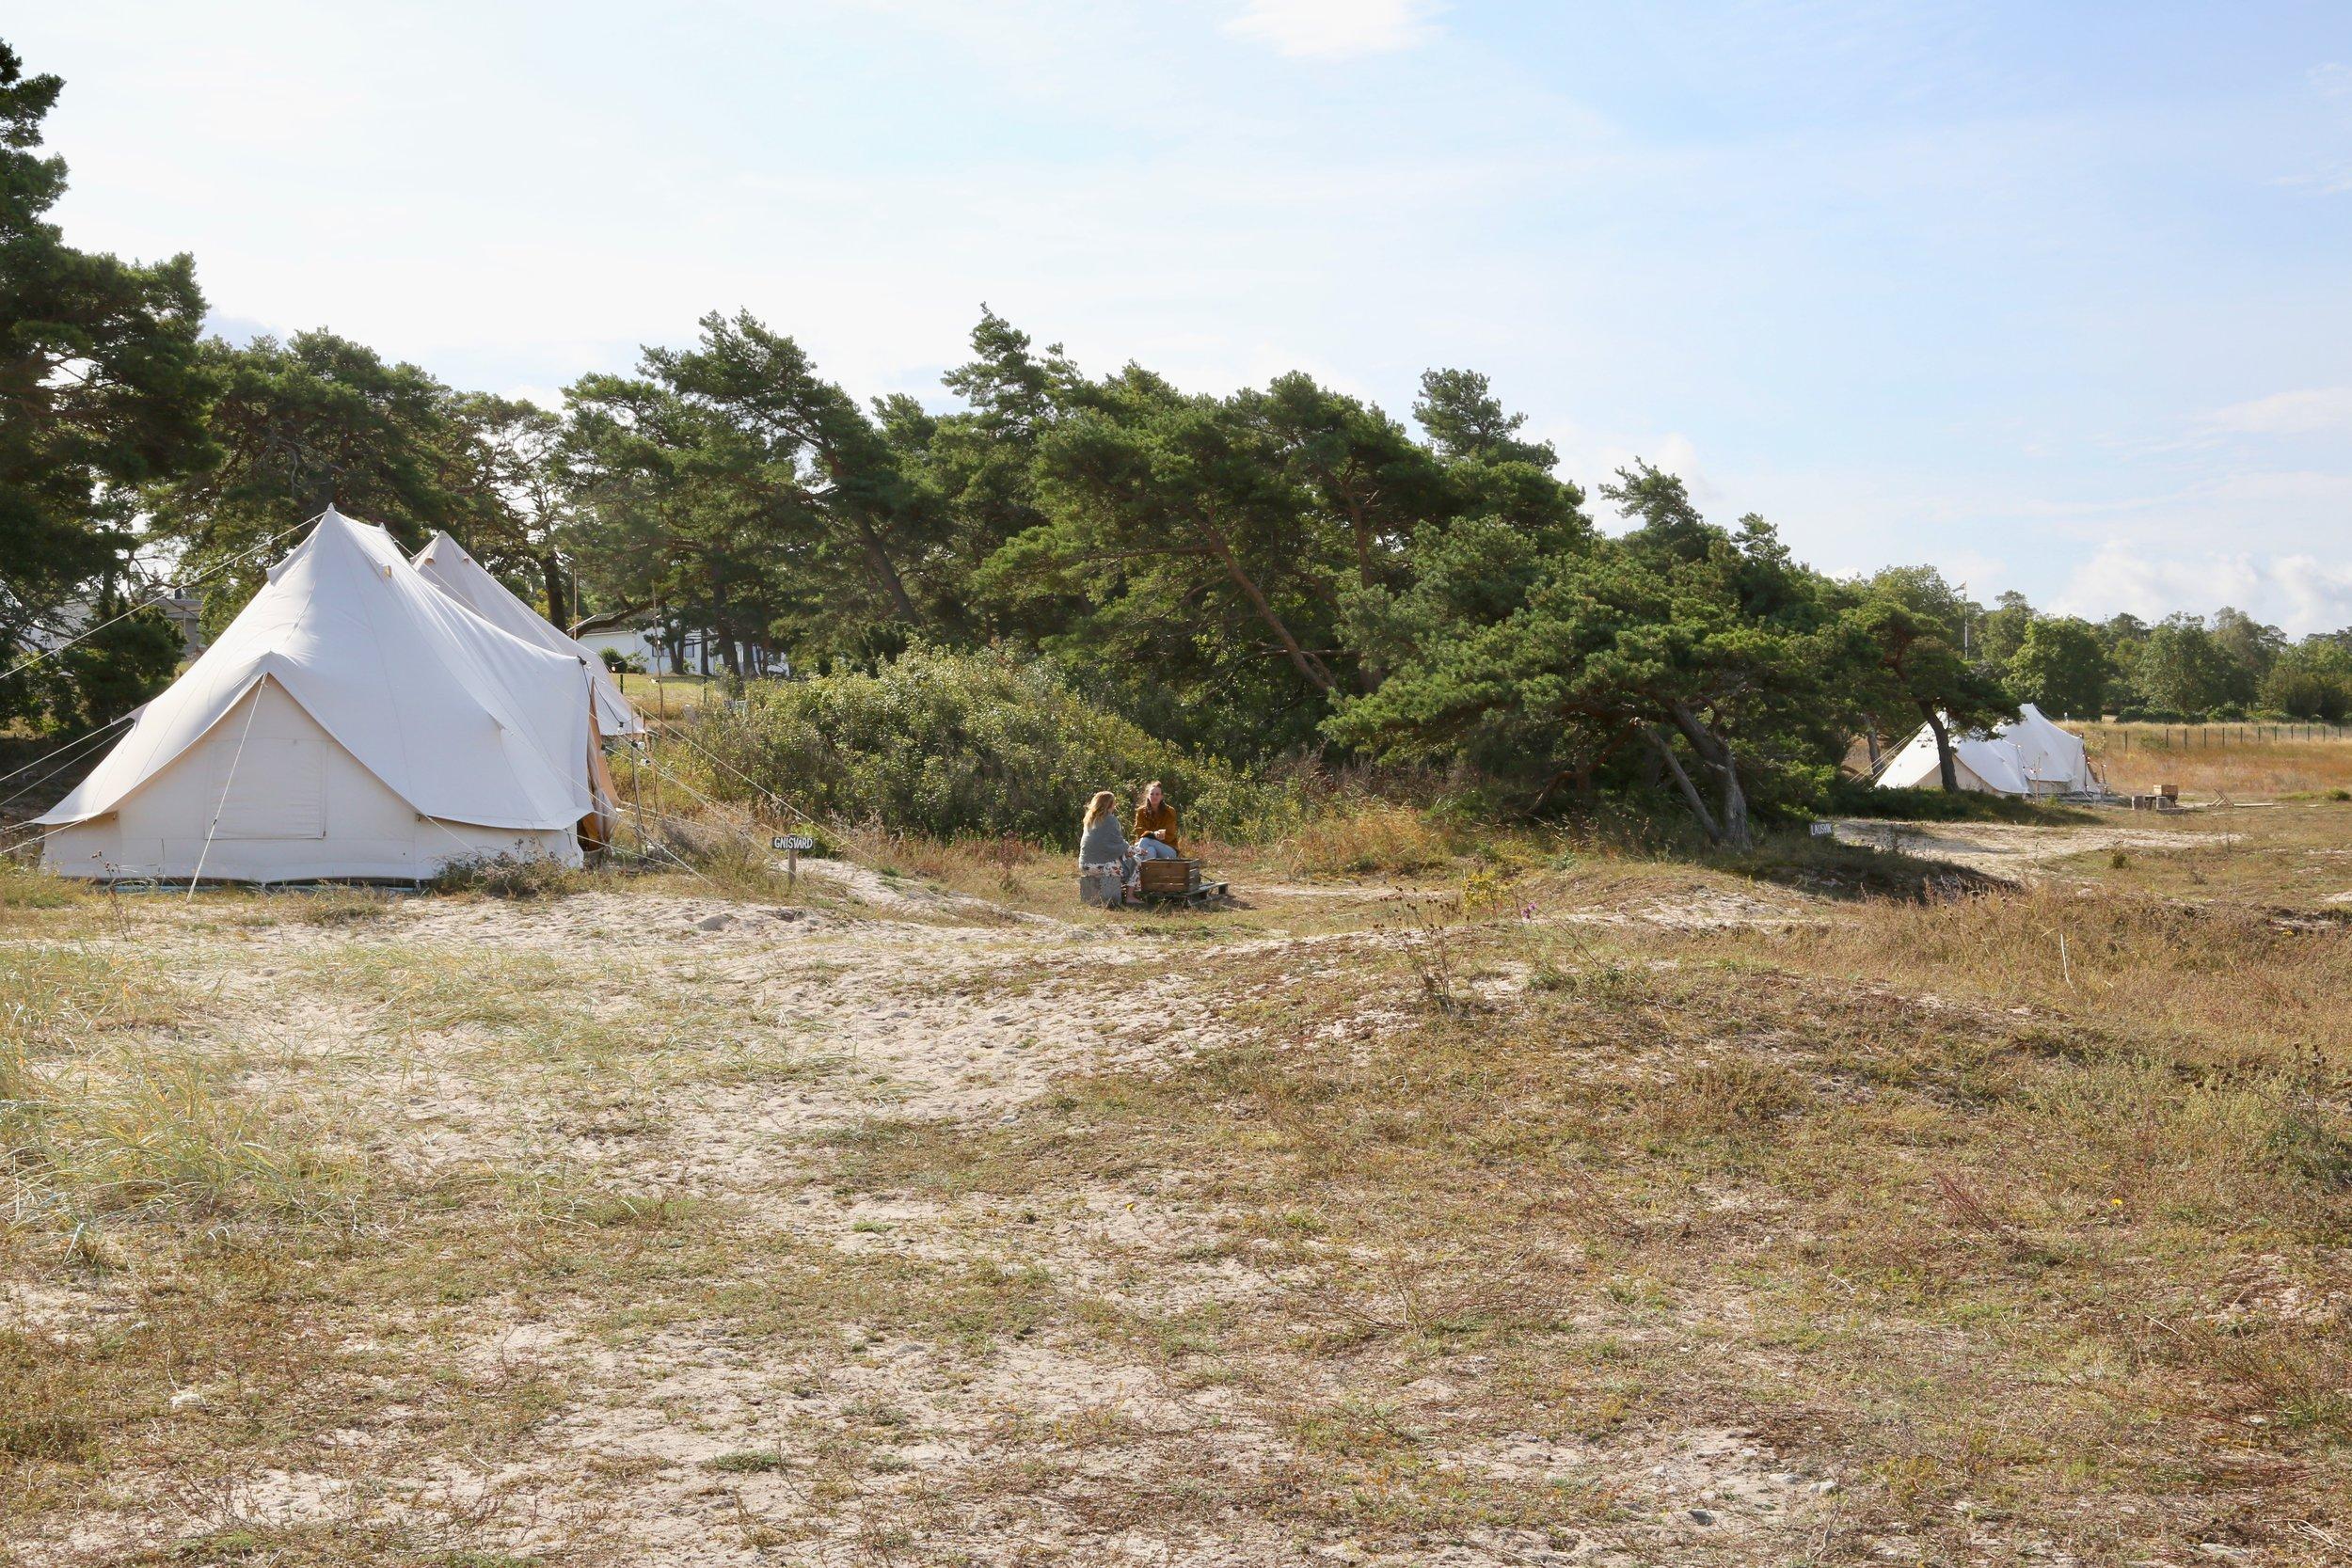 Surflogiet på Tofta på Gotland har luksustelt på stranden. Foto: Odd Roar Lange